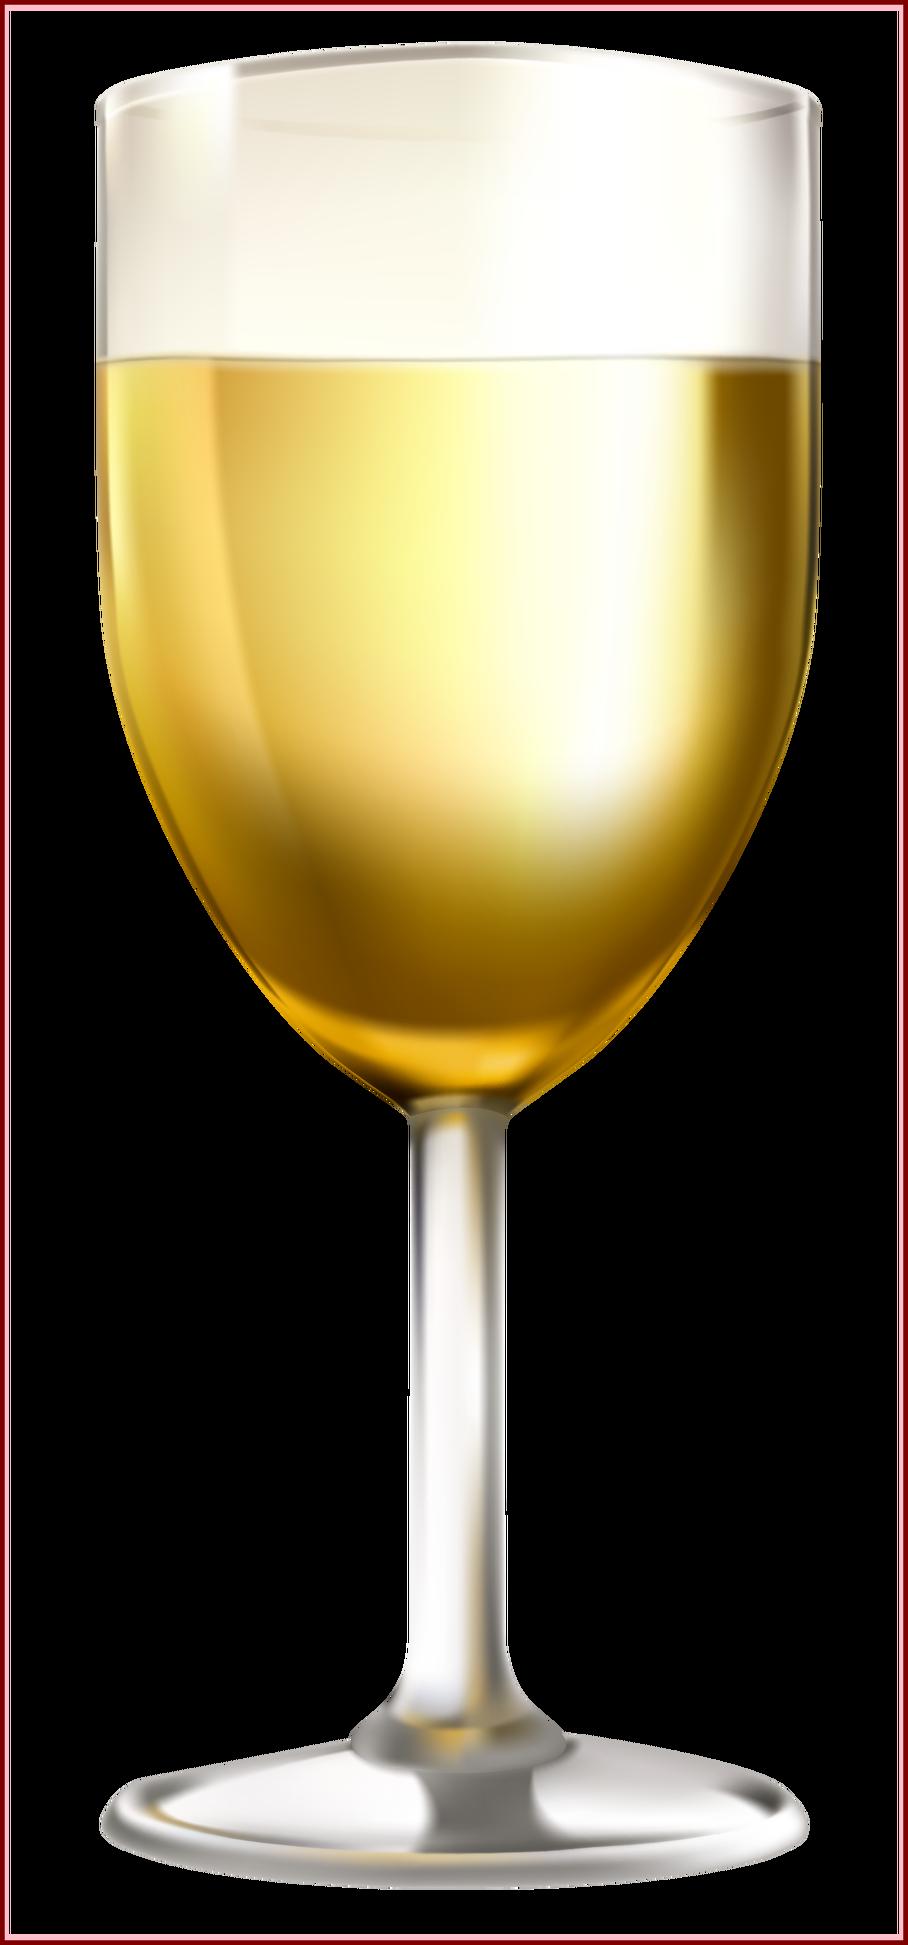 Drink clipart luau. Amazing white wine glass